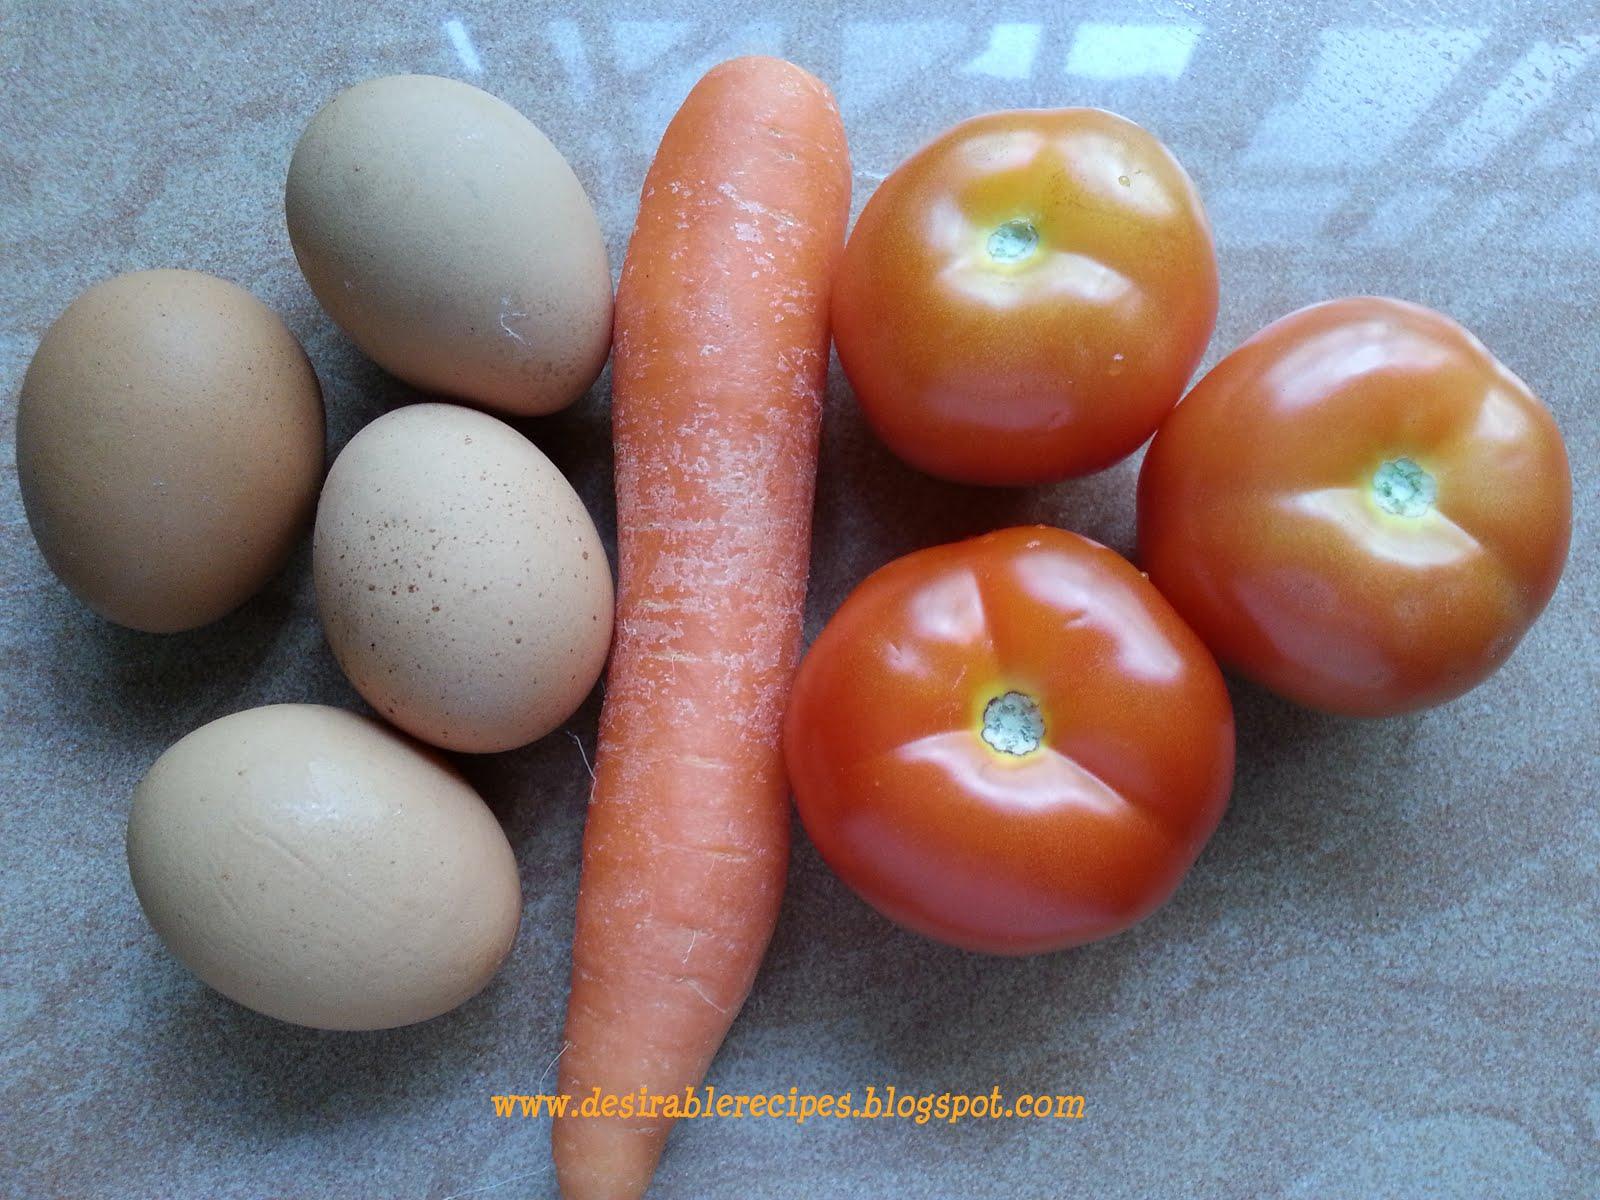 15 Minutes - Stir Fried Tomato, Carrot & Egg